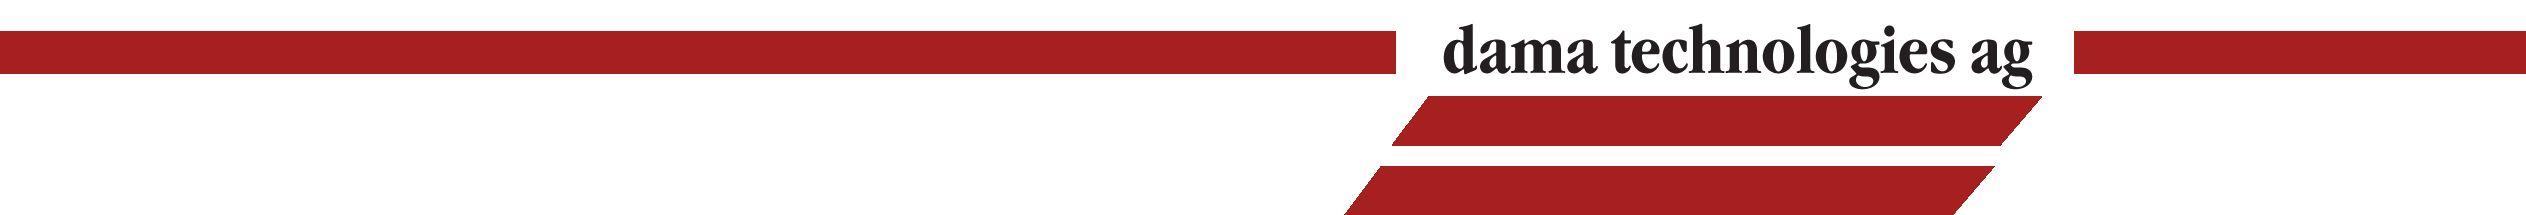 Logo dama technologies AG